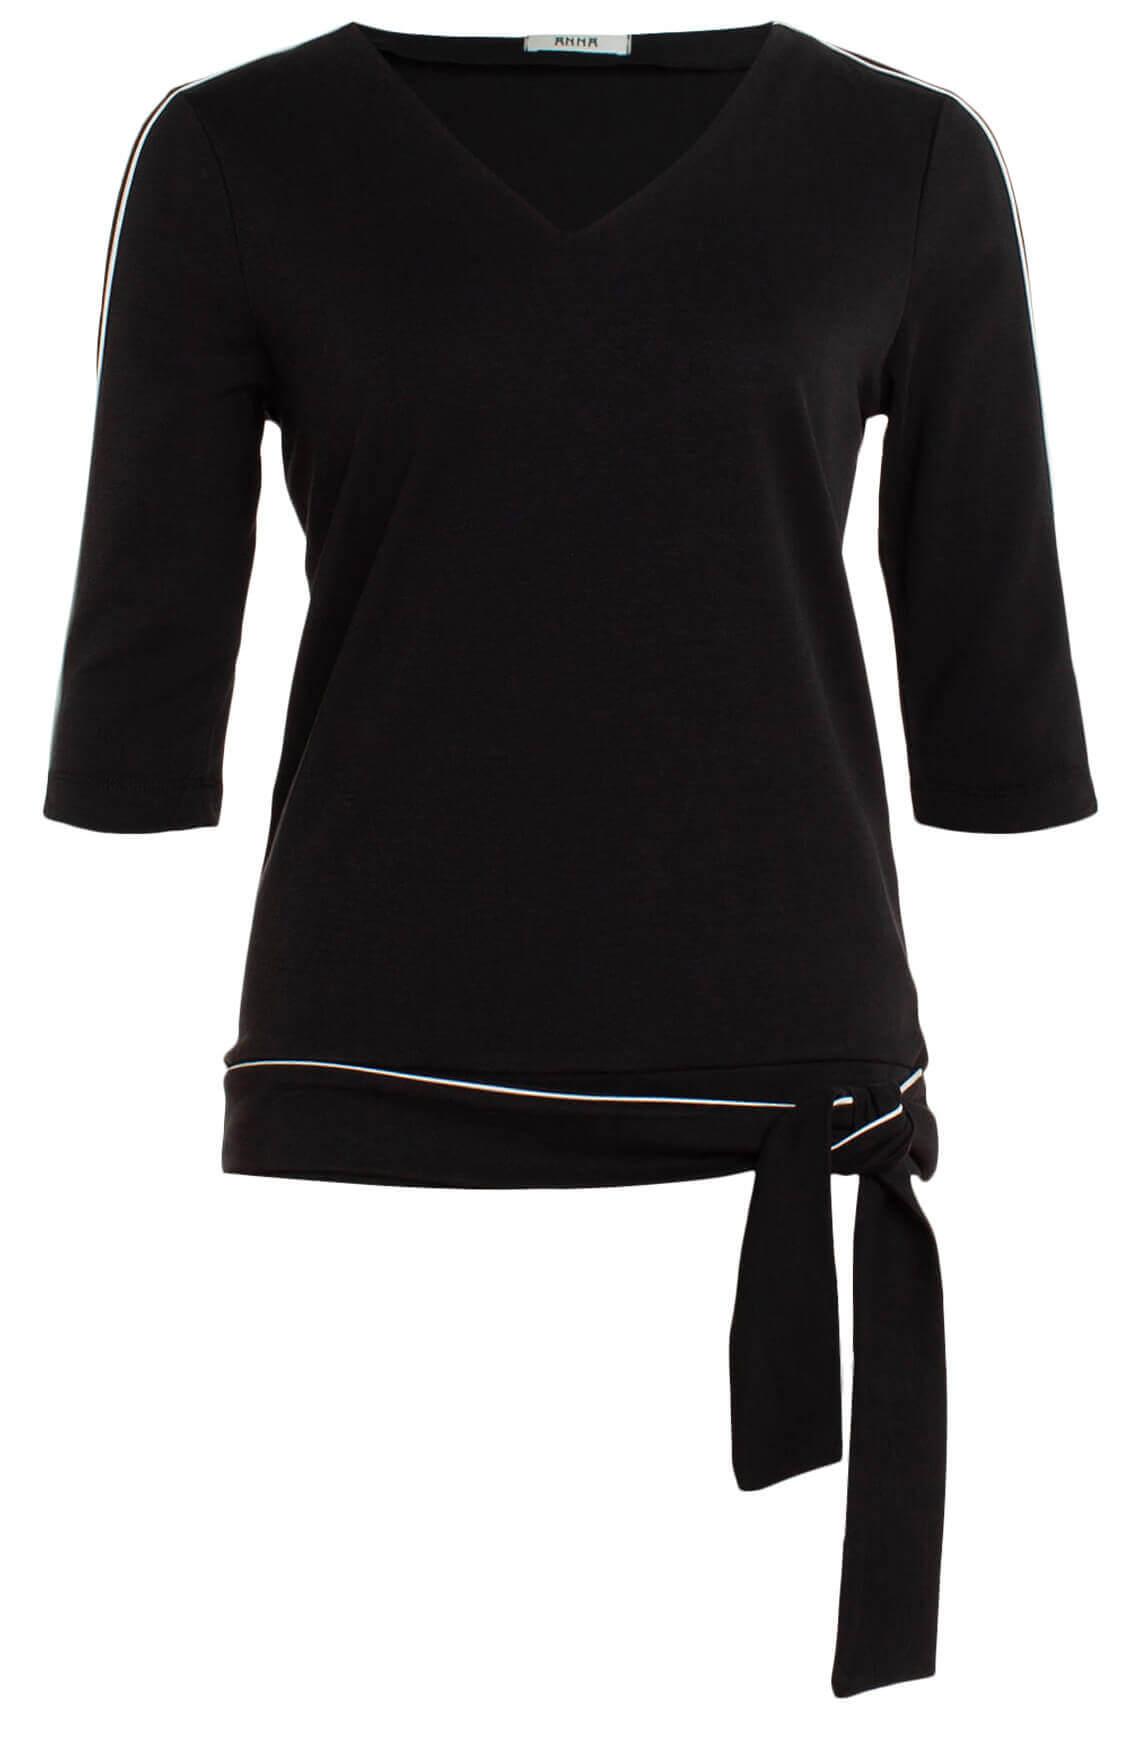 Anna Dames Shirt met ceintuur zwart